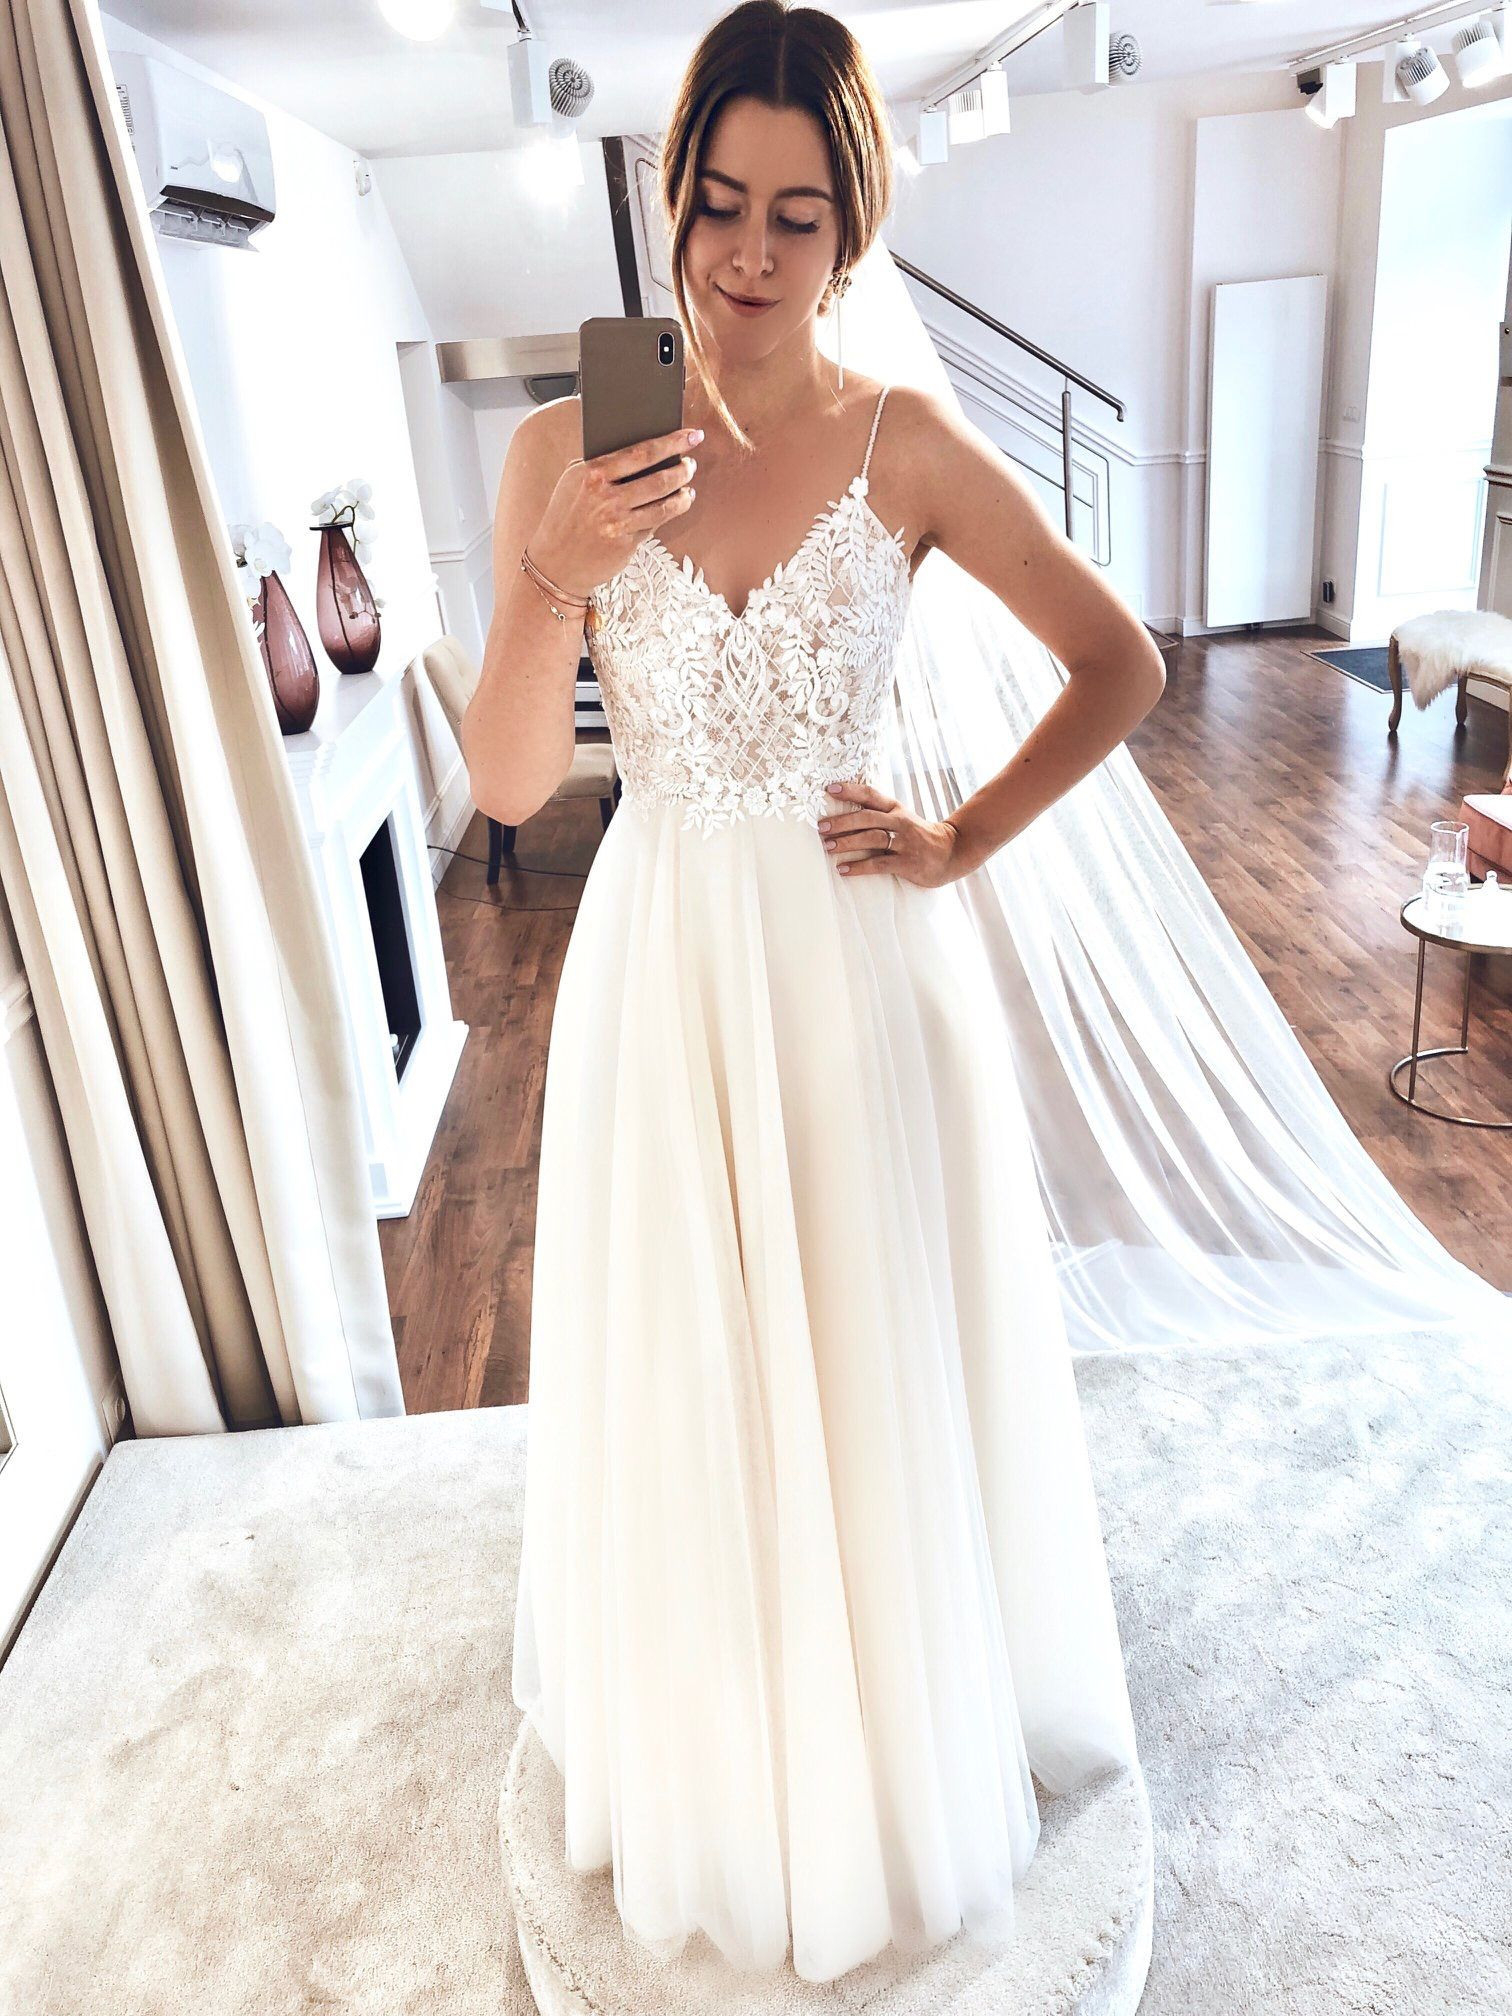 13 Kreativ Langes Abendkleid Weiß GalerieDesigner Spektakulär Langes Abendkleid Weiß Bester Preis